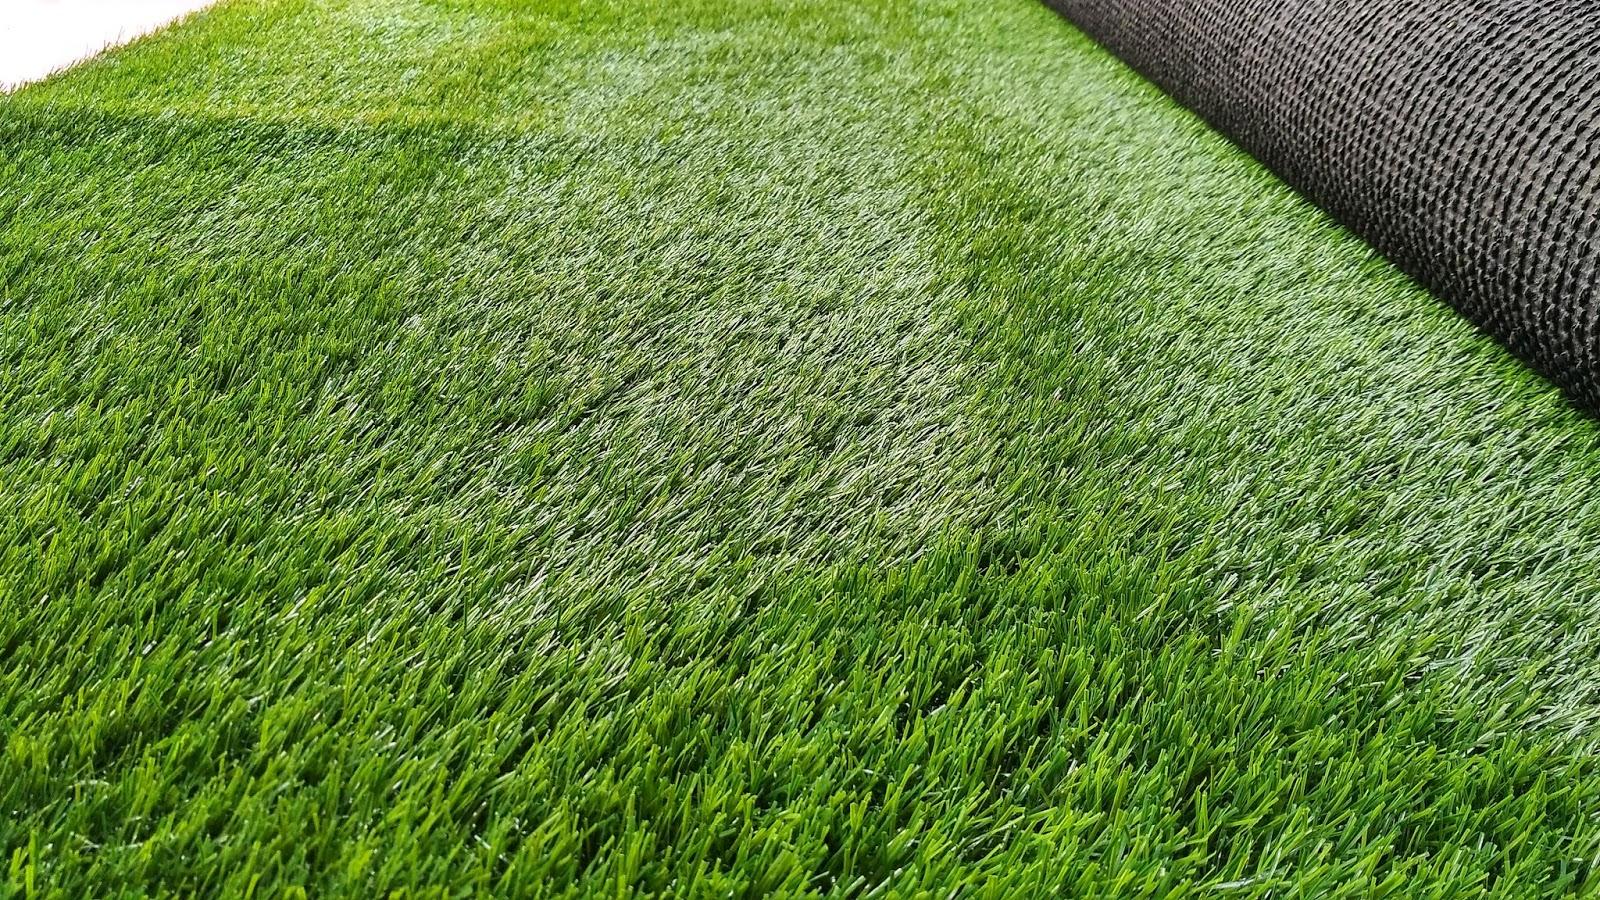 Pusat Rumput Sintetis Dan Biji Taman Minimalis Scotts Tags Sintetisrumput Murahrumput Swissrumput Jepangrumput Golfrumput Golf Keritingbiji